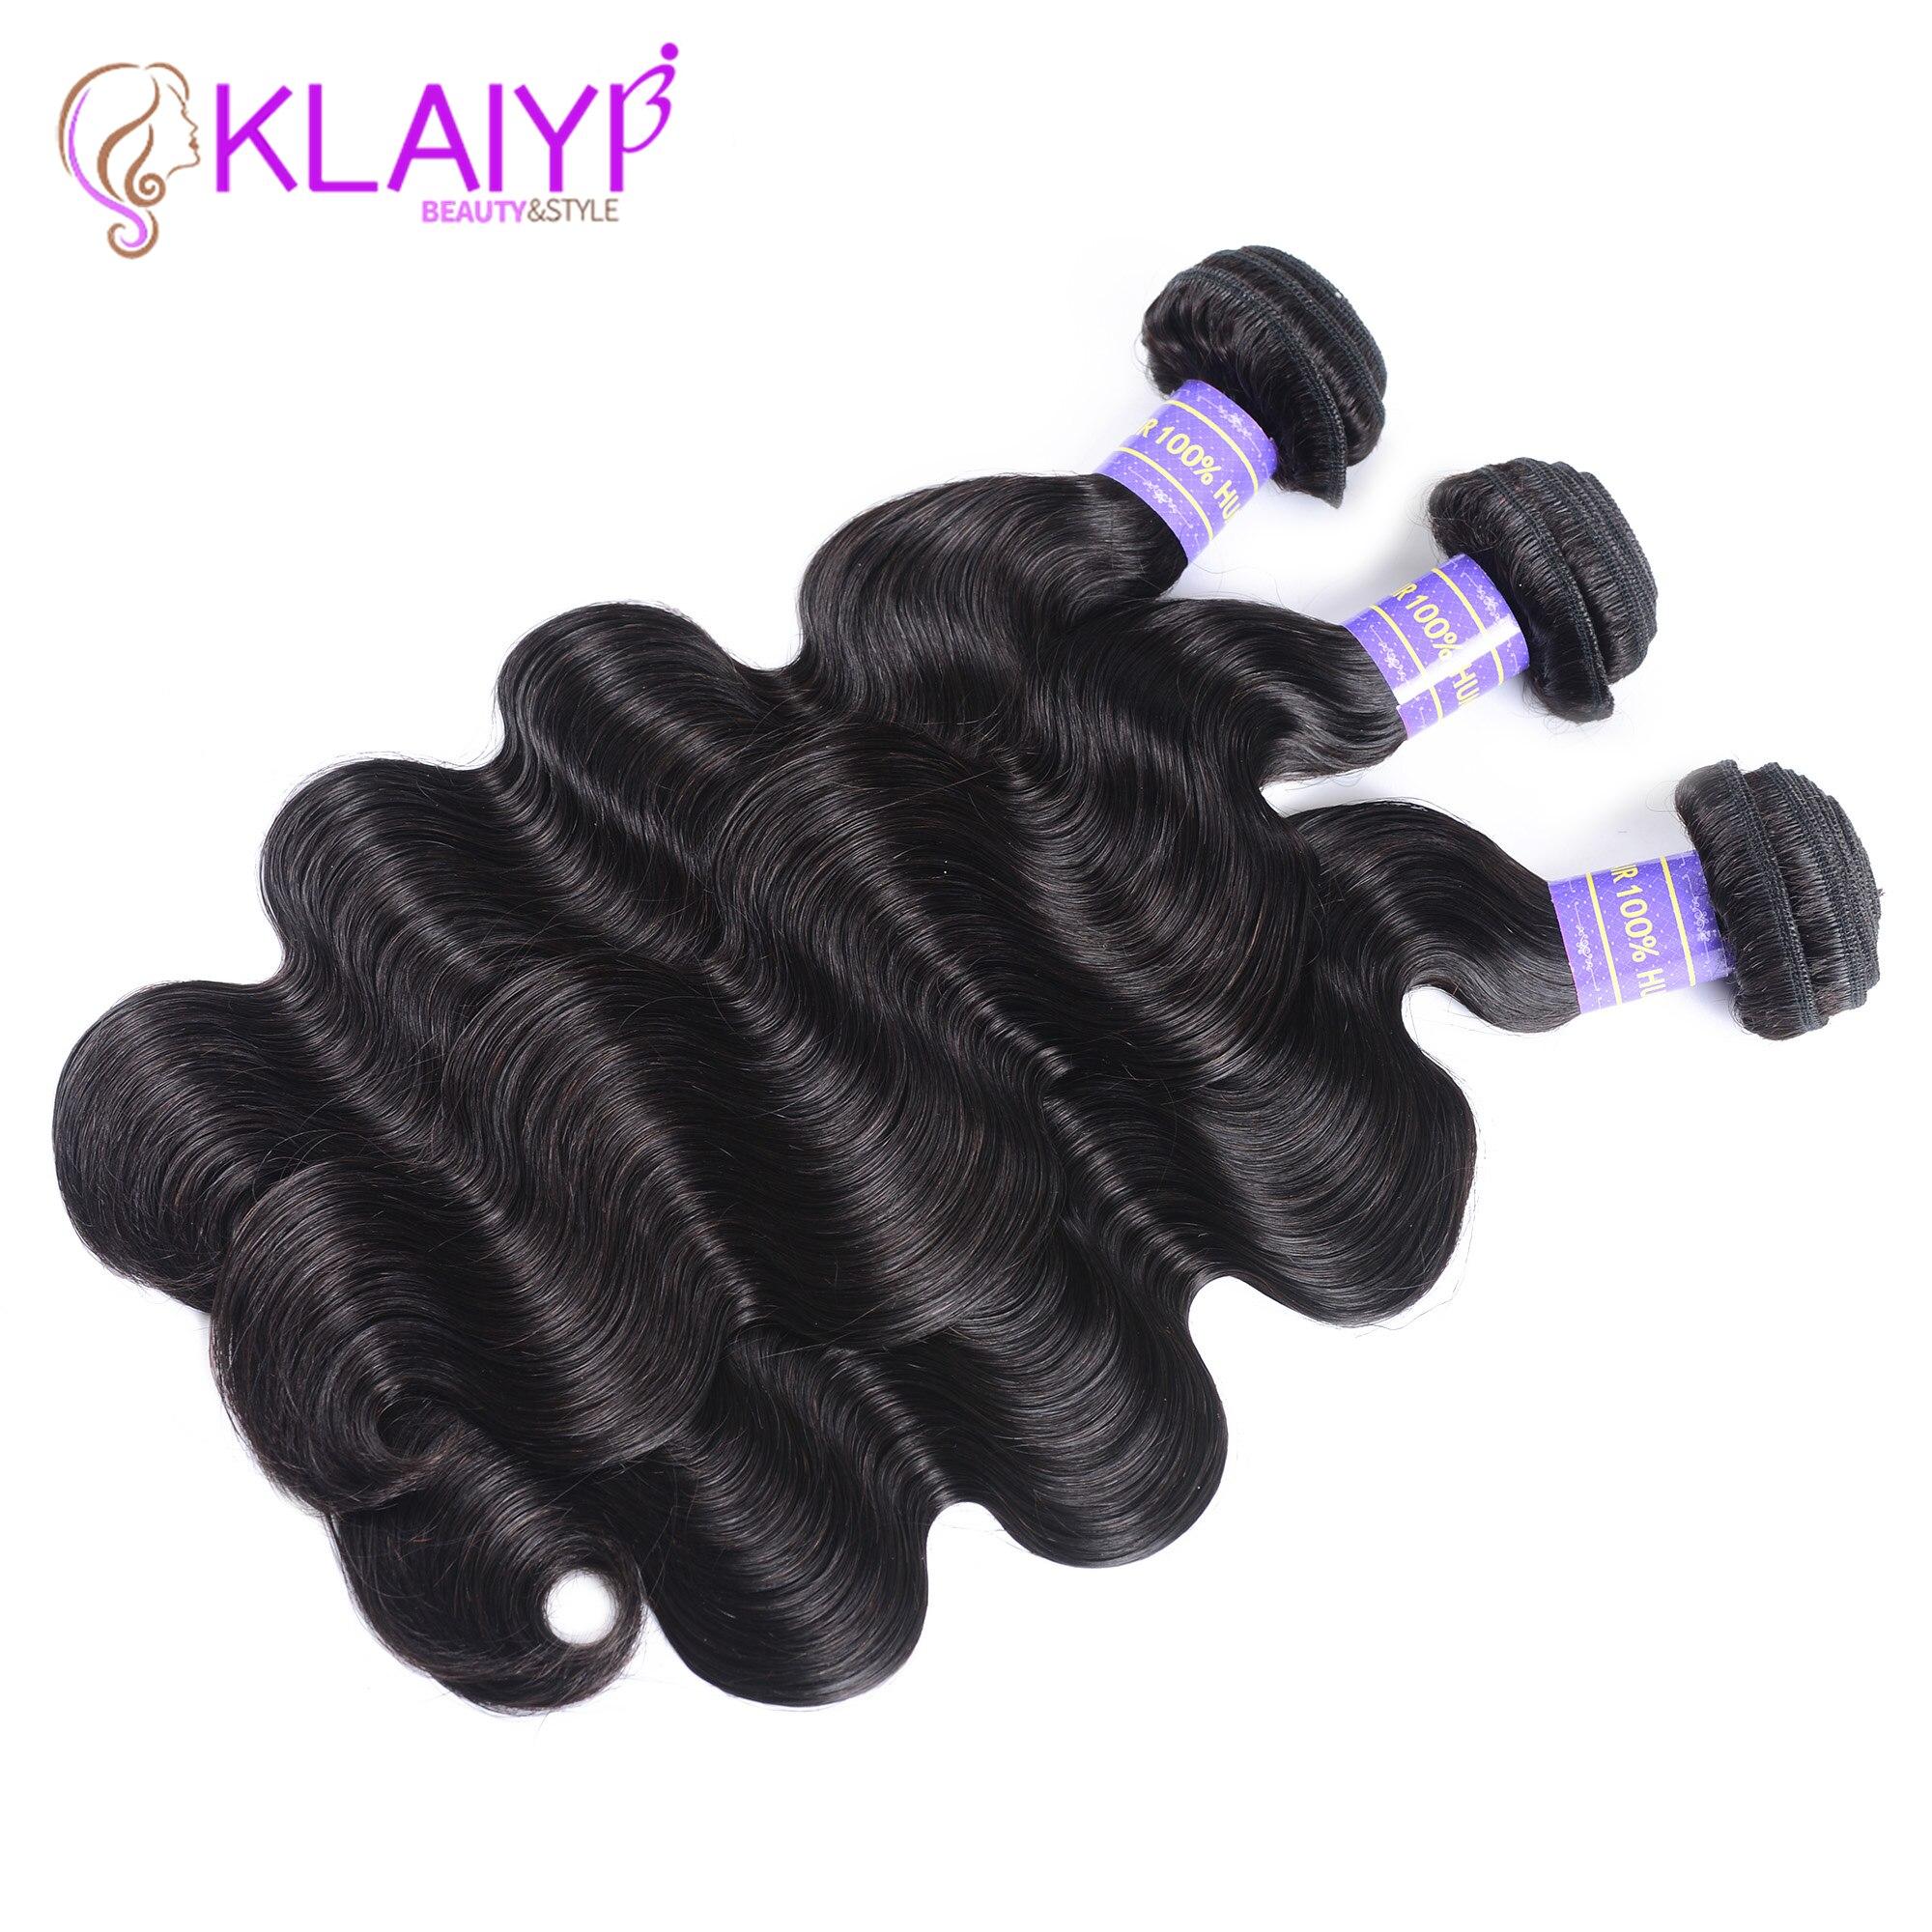 Klaiyi Brazilian Hair Weave 3 Bundles Body Wave Natural Black Color Human Hair Extension Remy Hair 3 pieces/lot Can Be Dyed